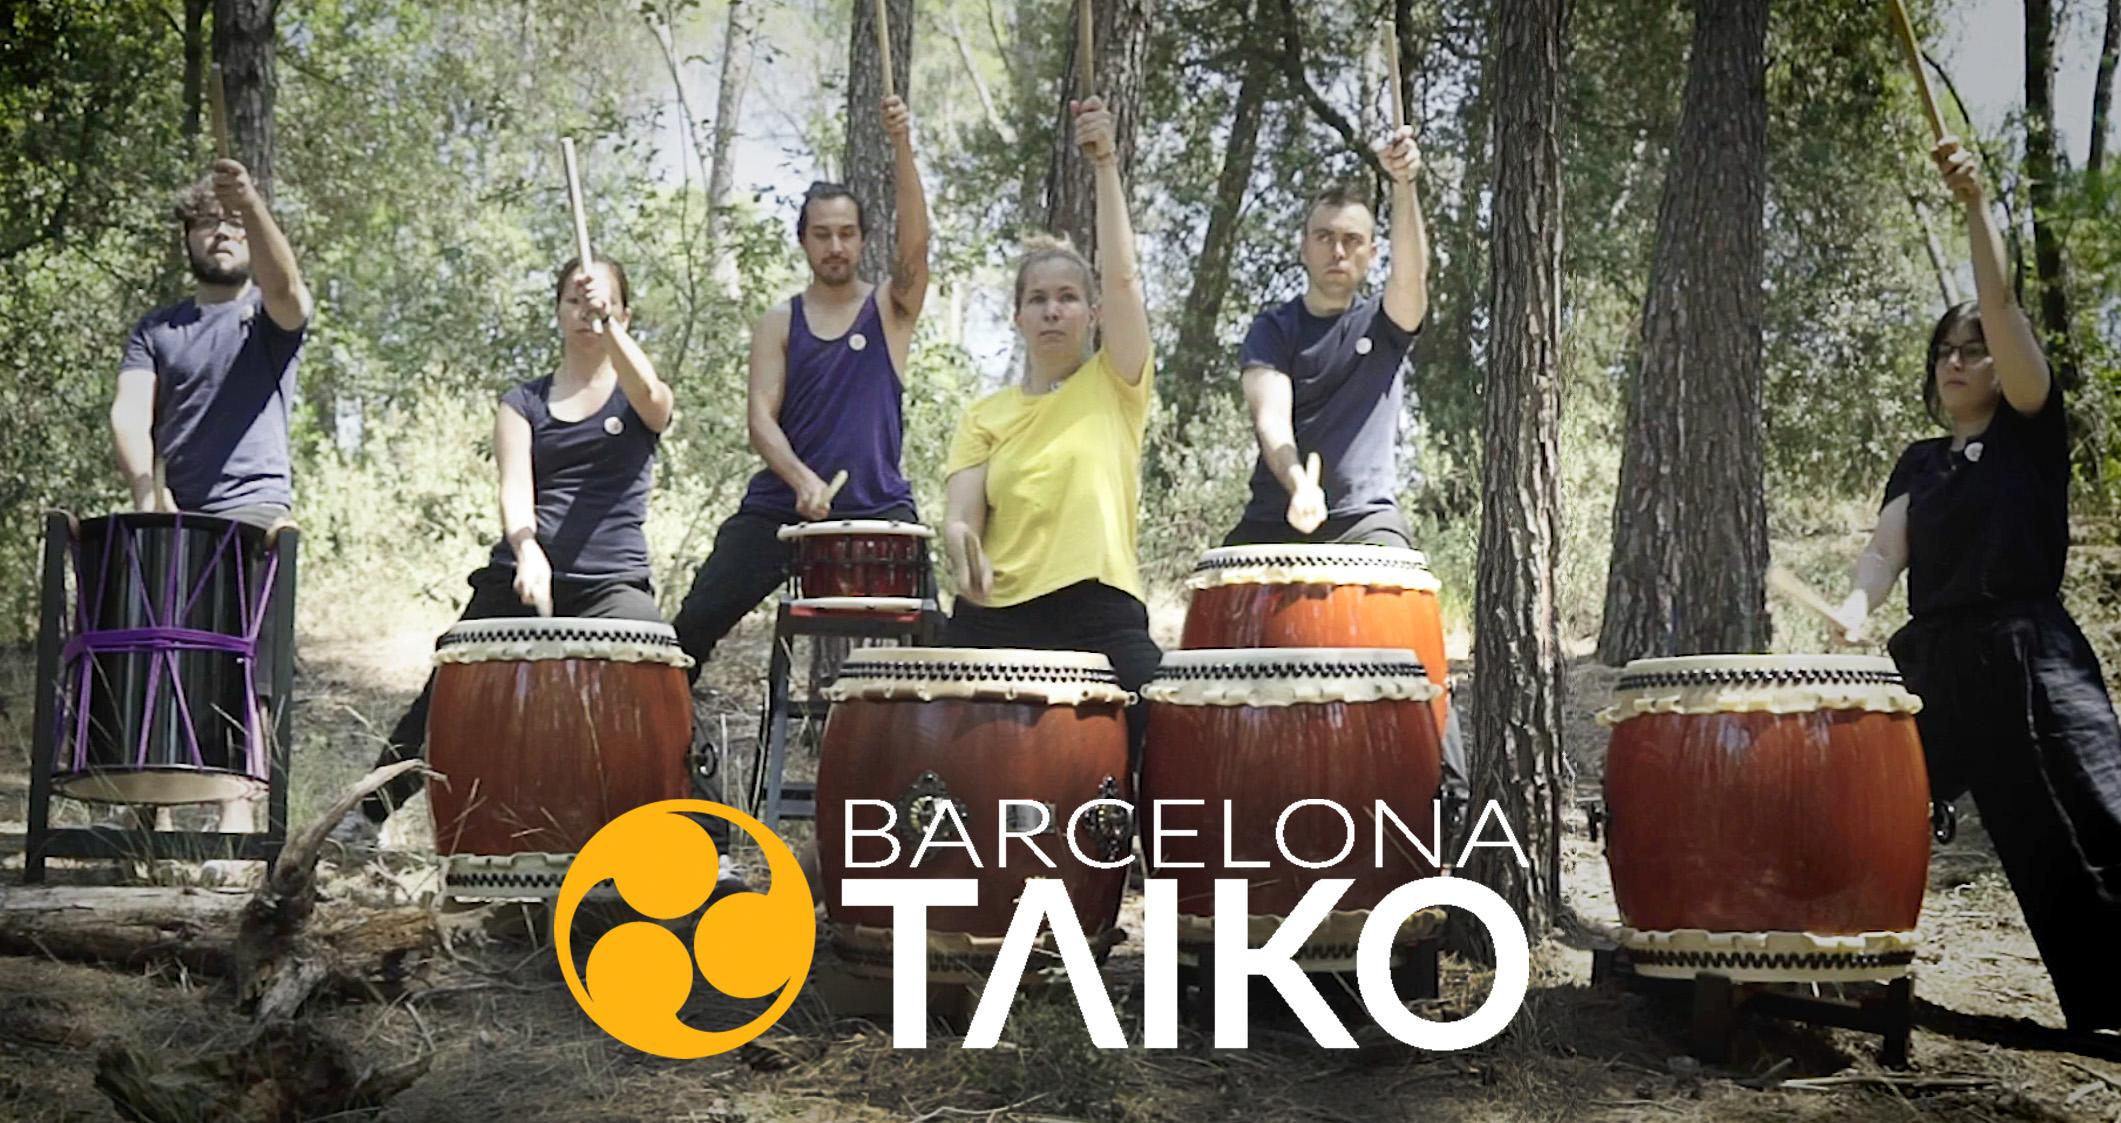 Barcelona Taiko 2019